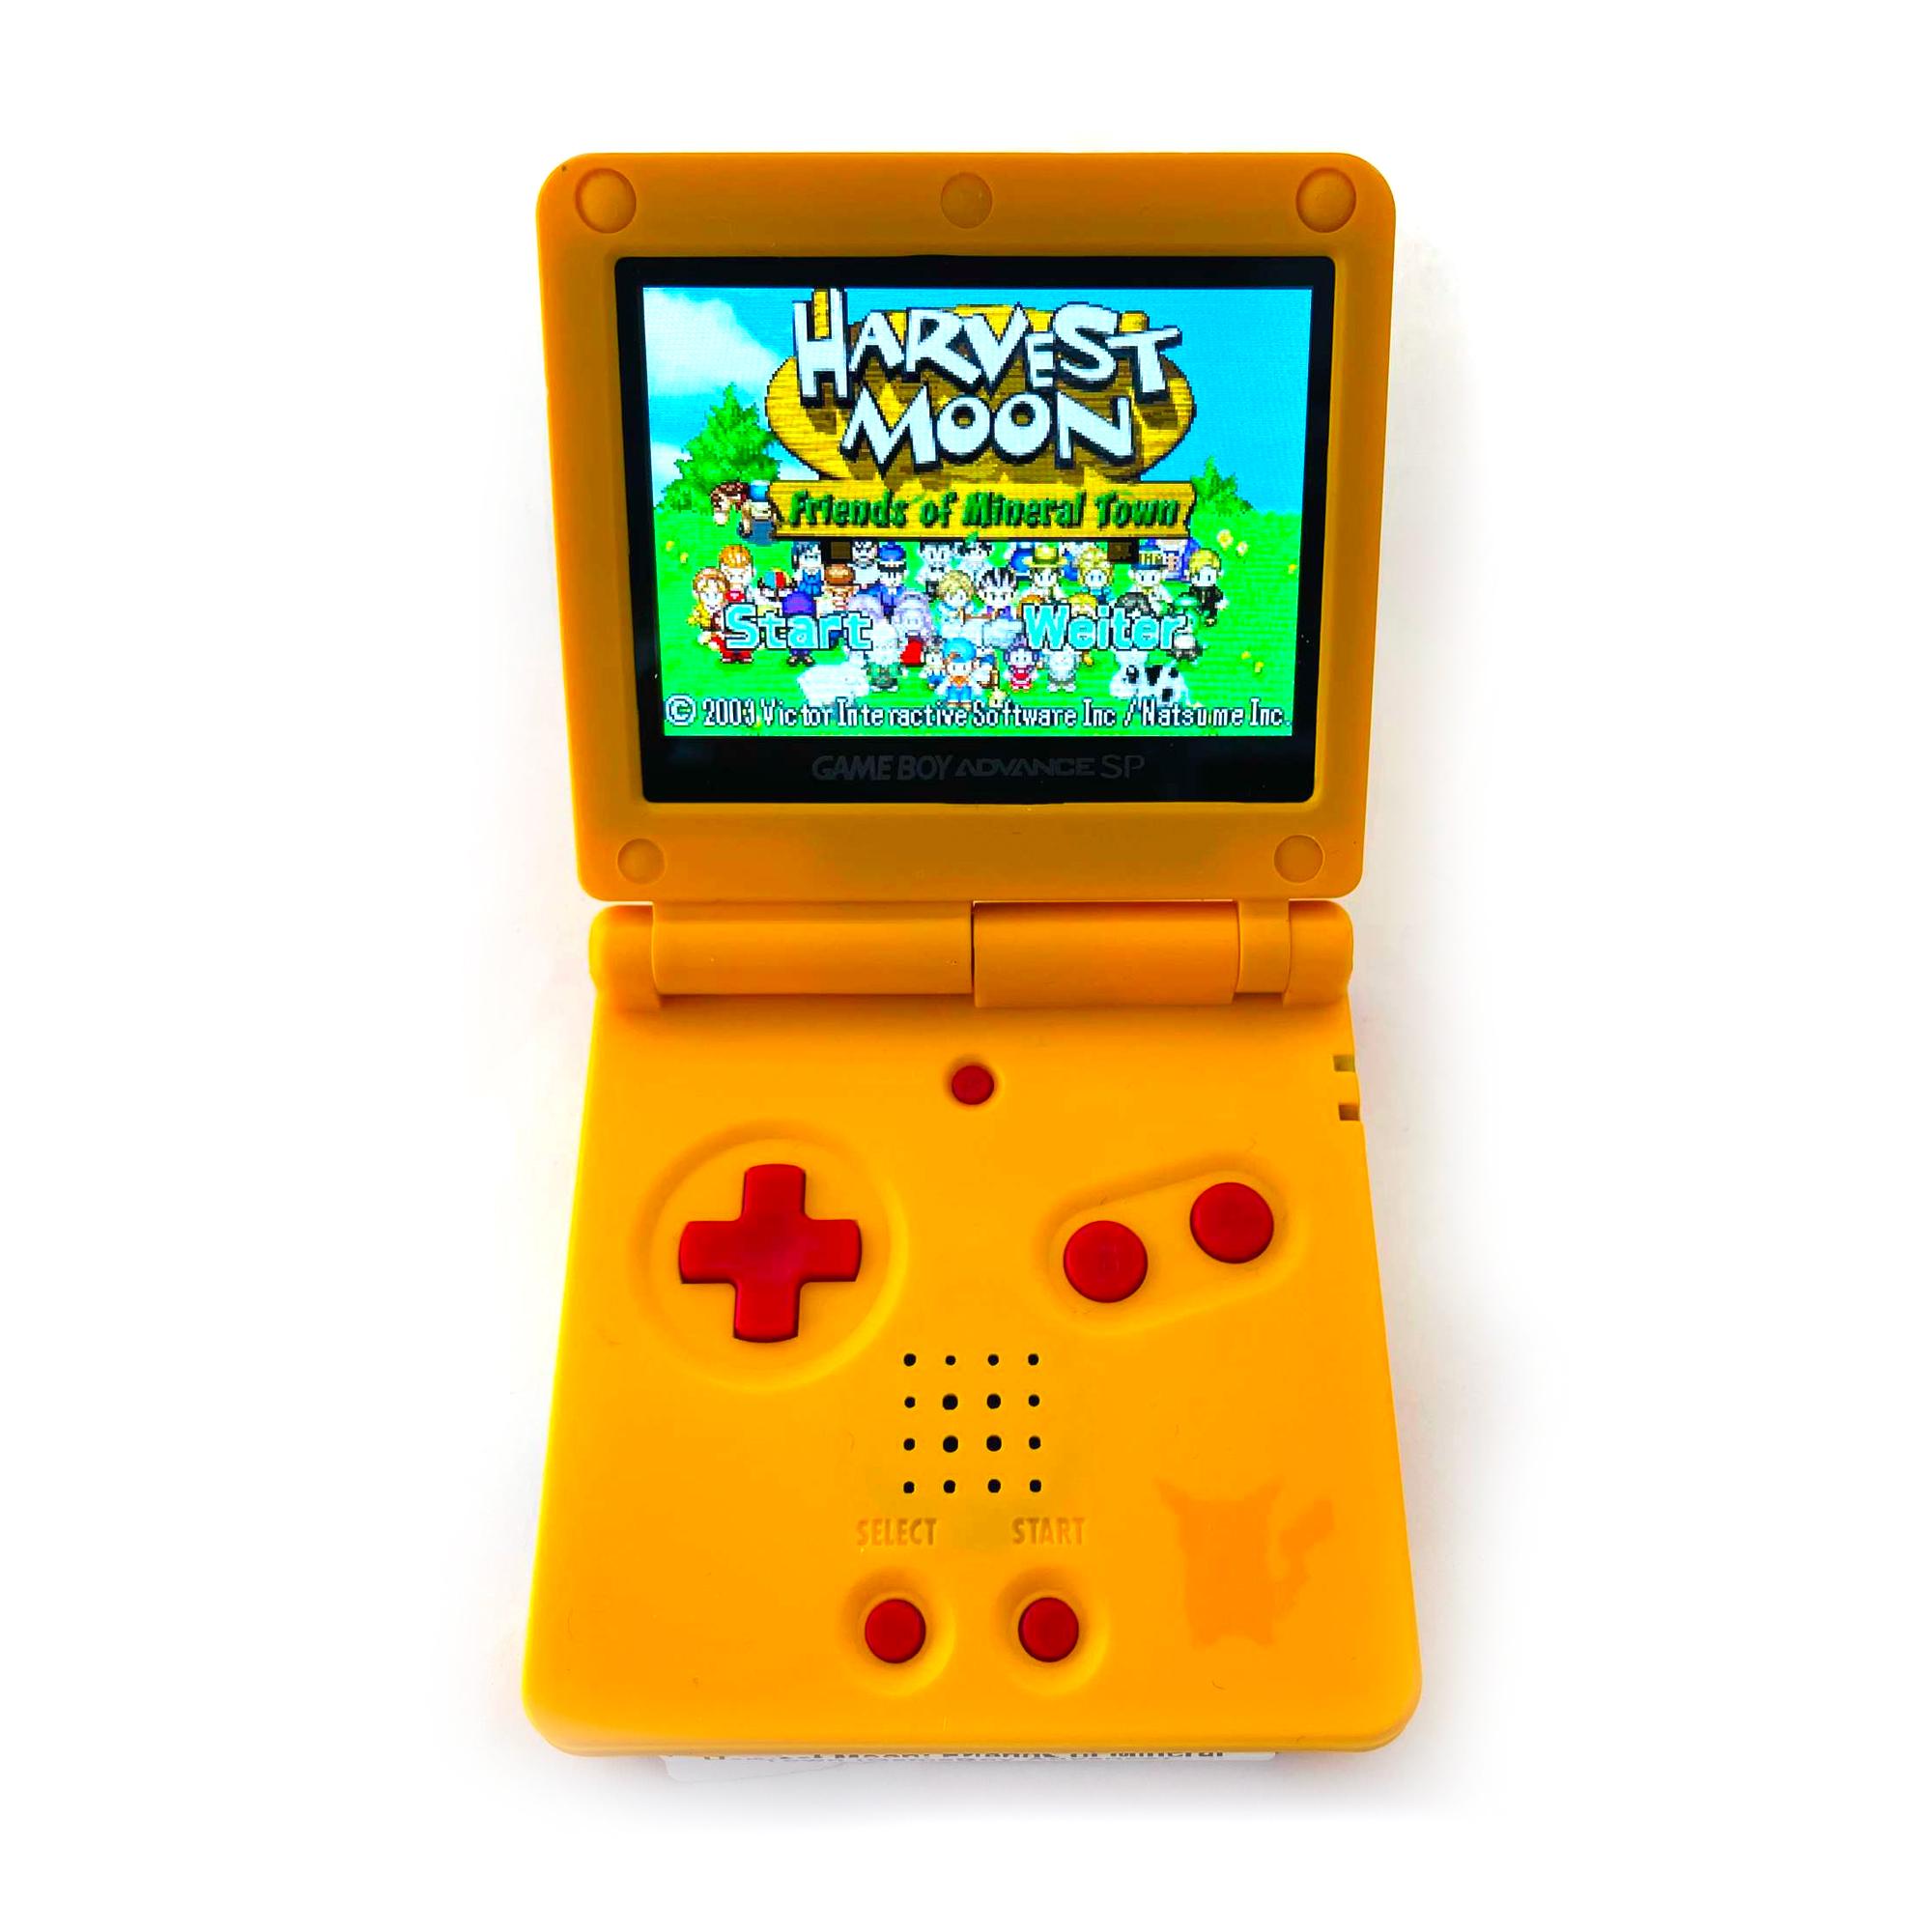 Konsole GBA SP AGS-001 LCD-Mod #Pikachu Edition + Netzteil